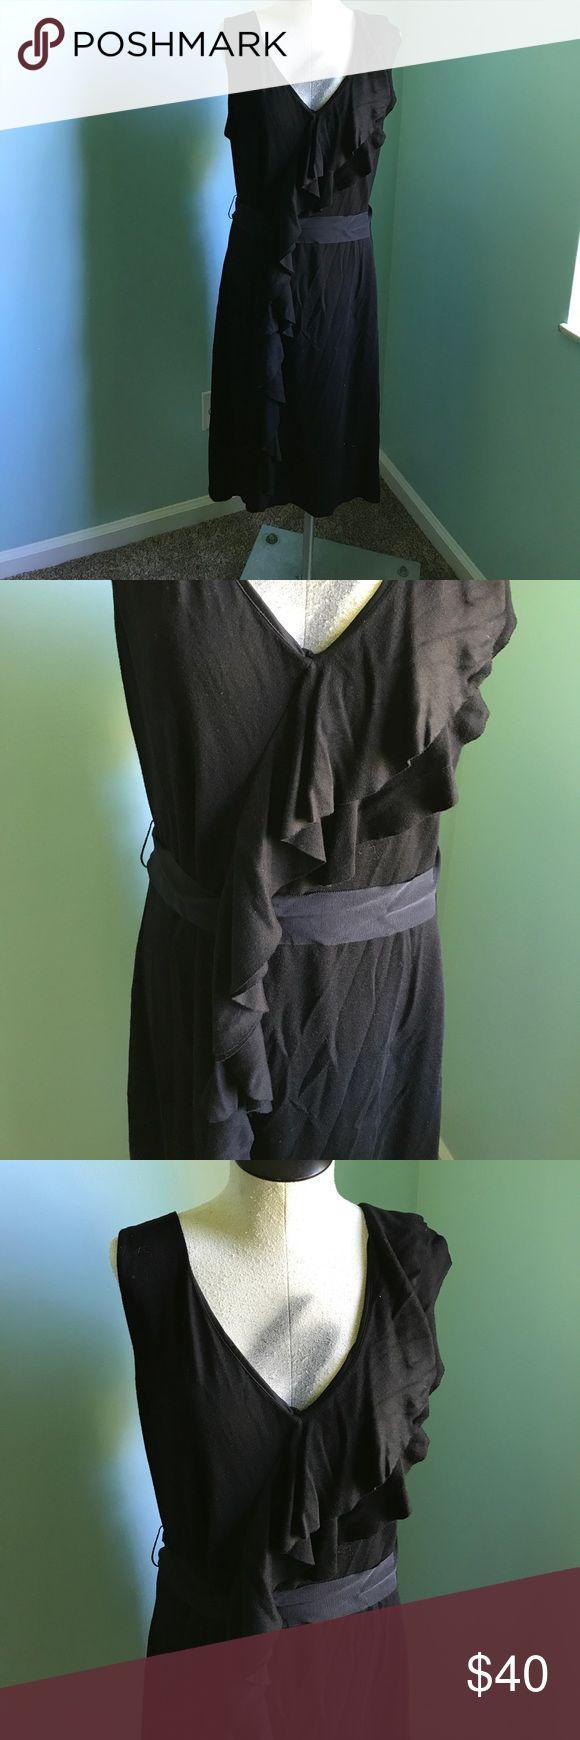 Ann Taylor Loft Dress In good condition! Perfect for a summer wedding! Ann Taylor Dresses Asymmetrical